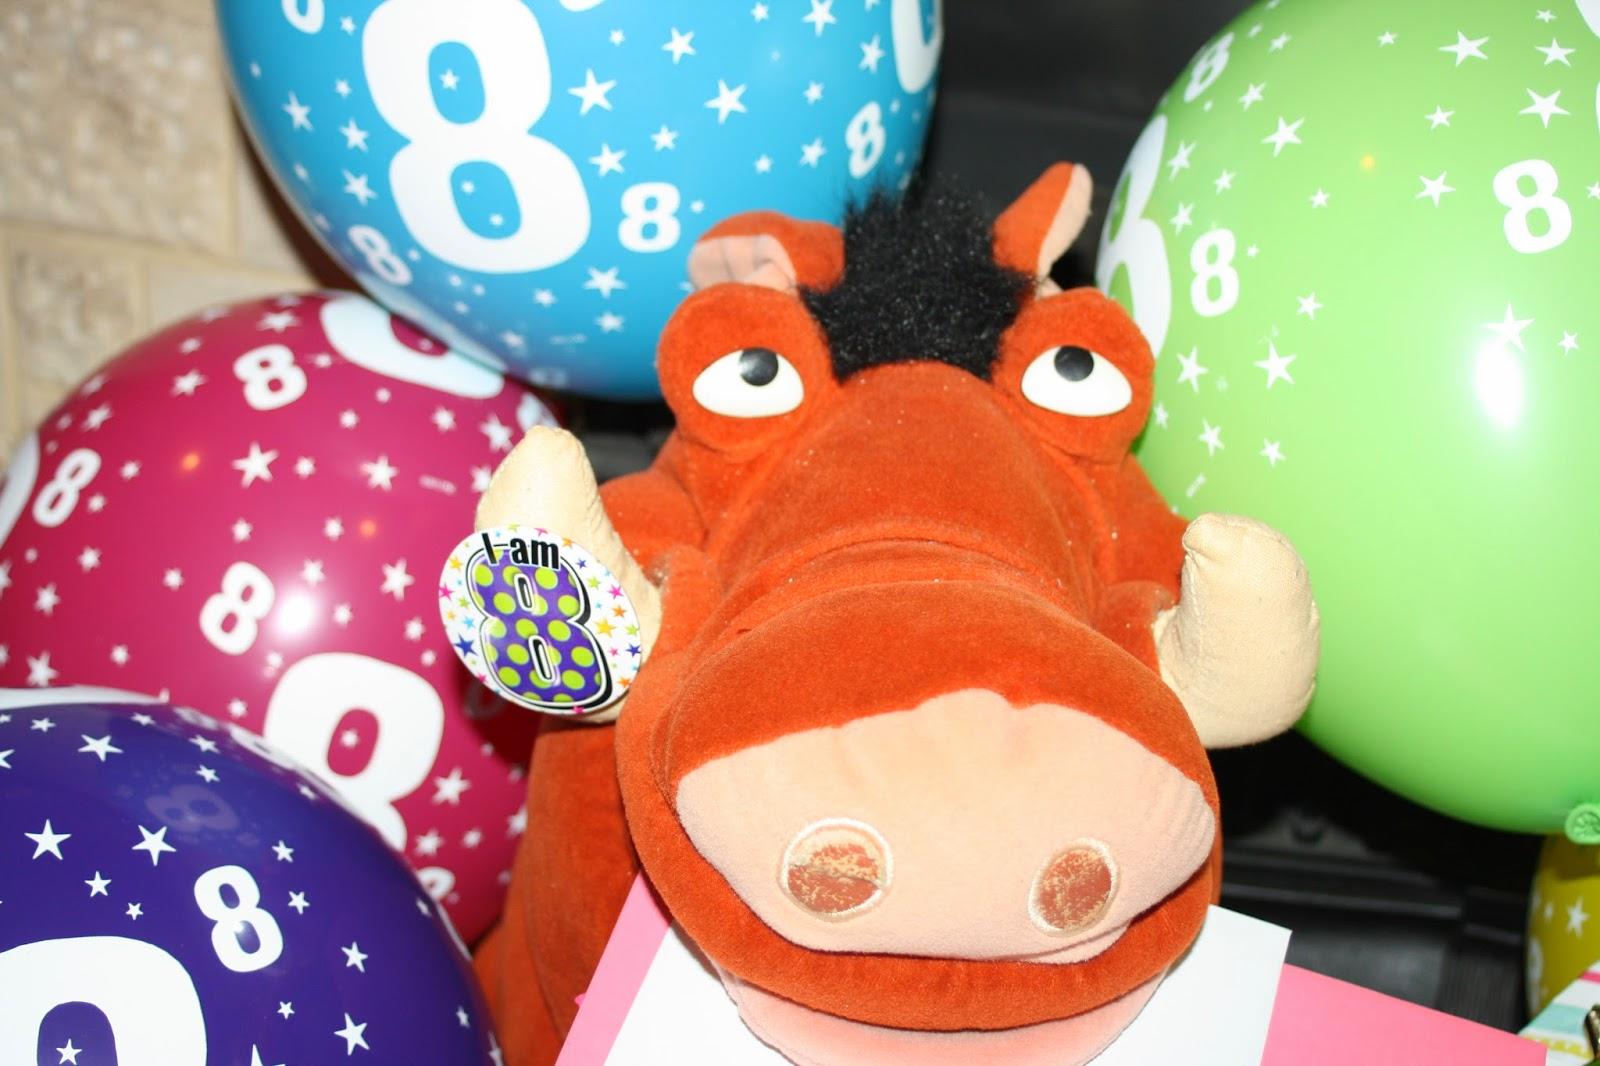 Birthday-presents-balloons-daughter-Silent-Sunday